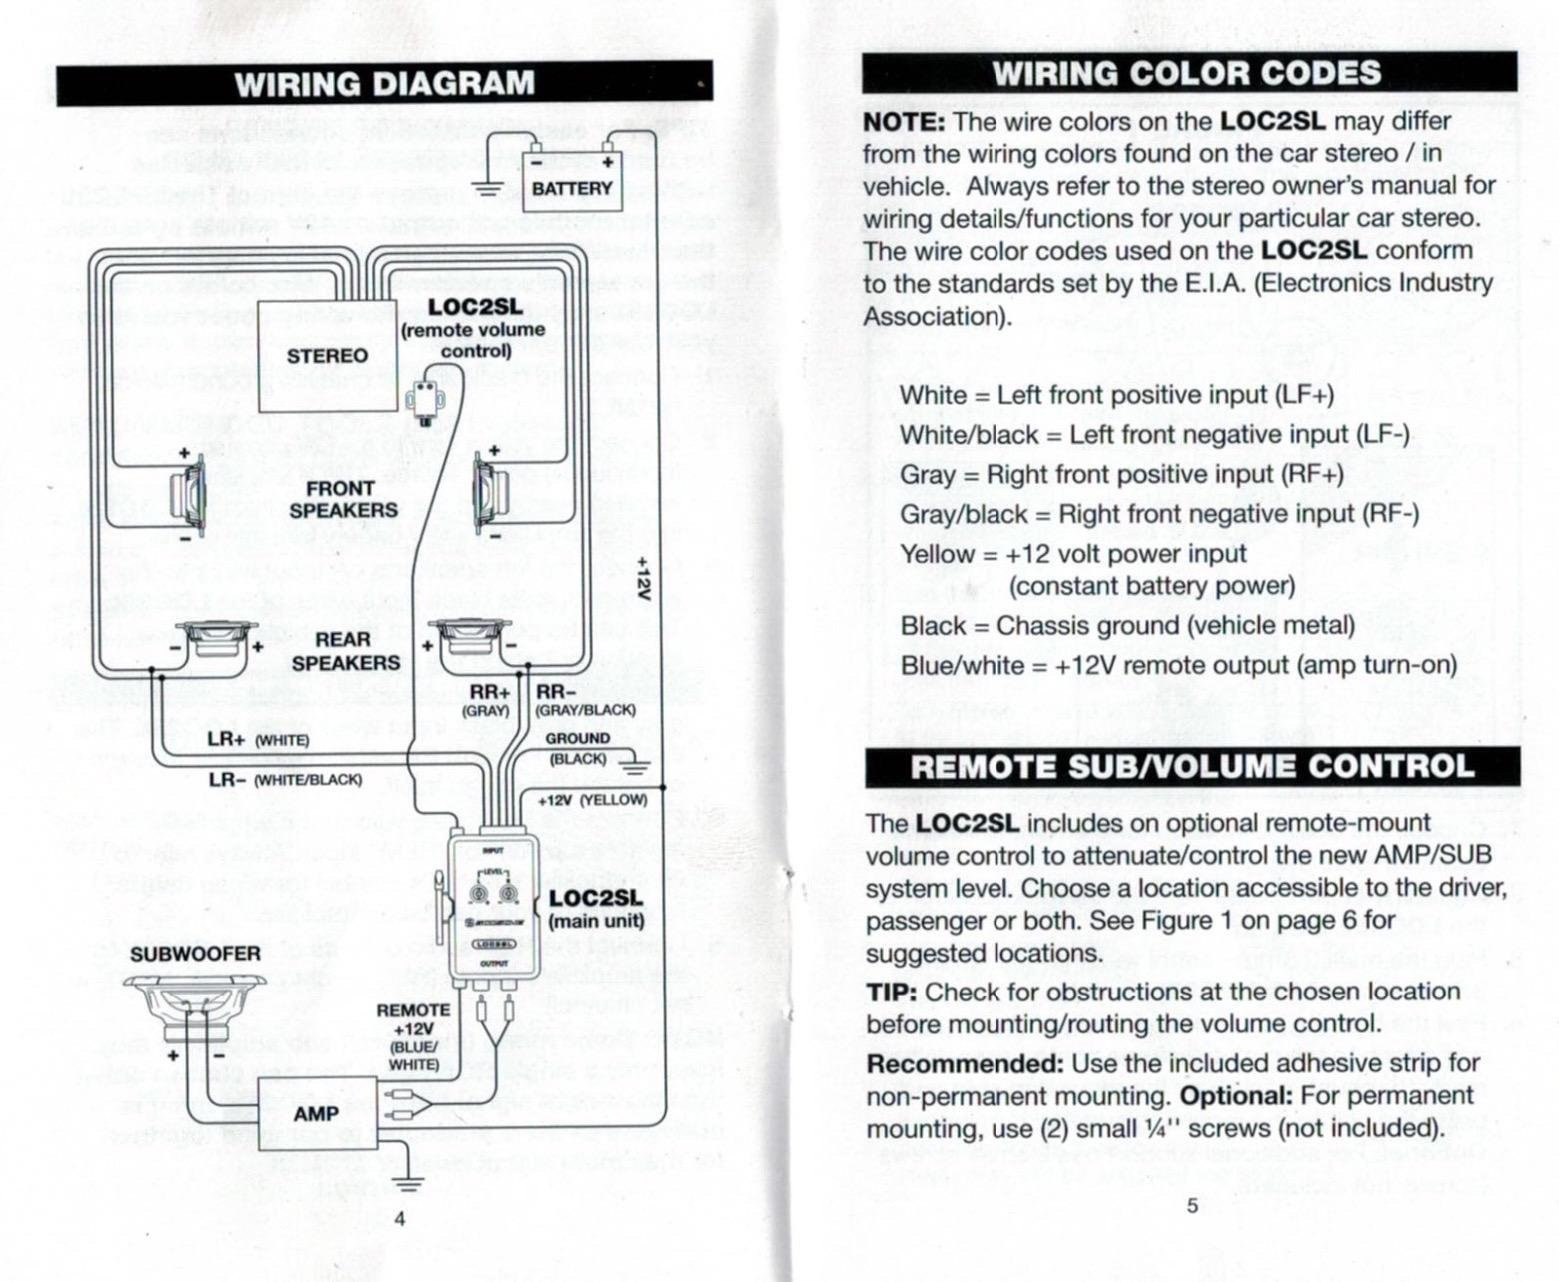 Diagram Rally Pac Wiring Diagram Full Version Hd Quality Wiring Diagram Keyboarddiagram Eracleaturismo It